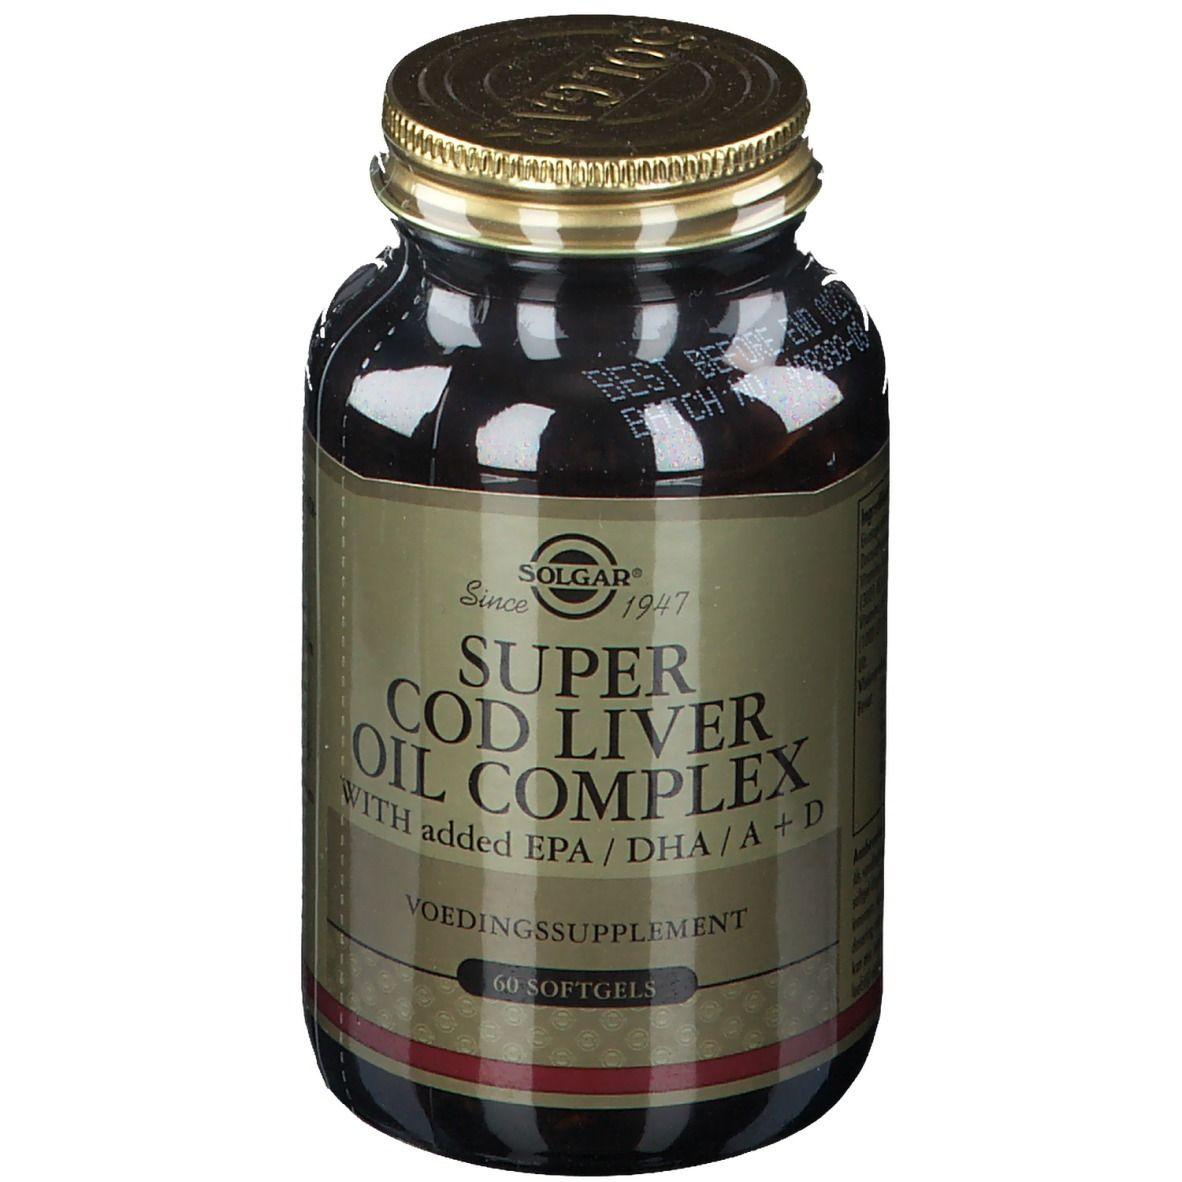 Solgar® Super Cod Liver Oil Complex (Huile de foie de morue) pc(s) capsule(s)